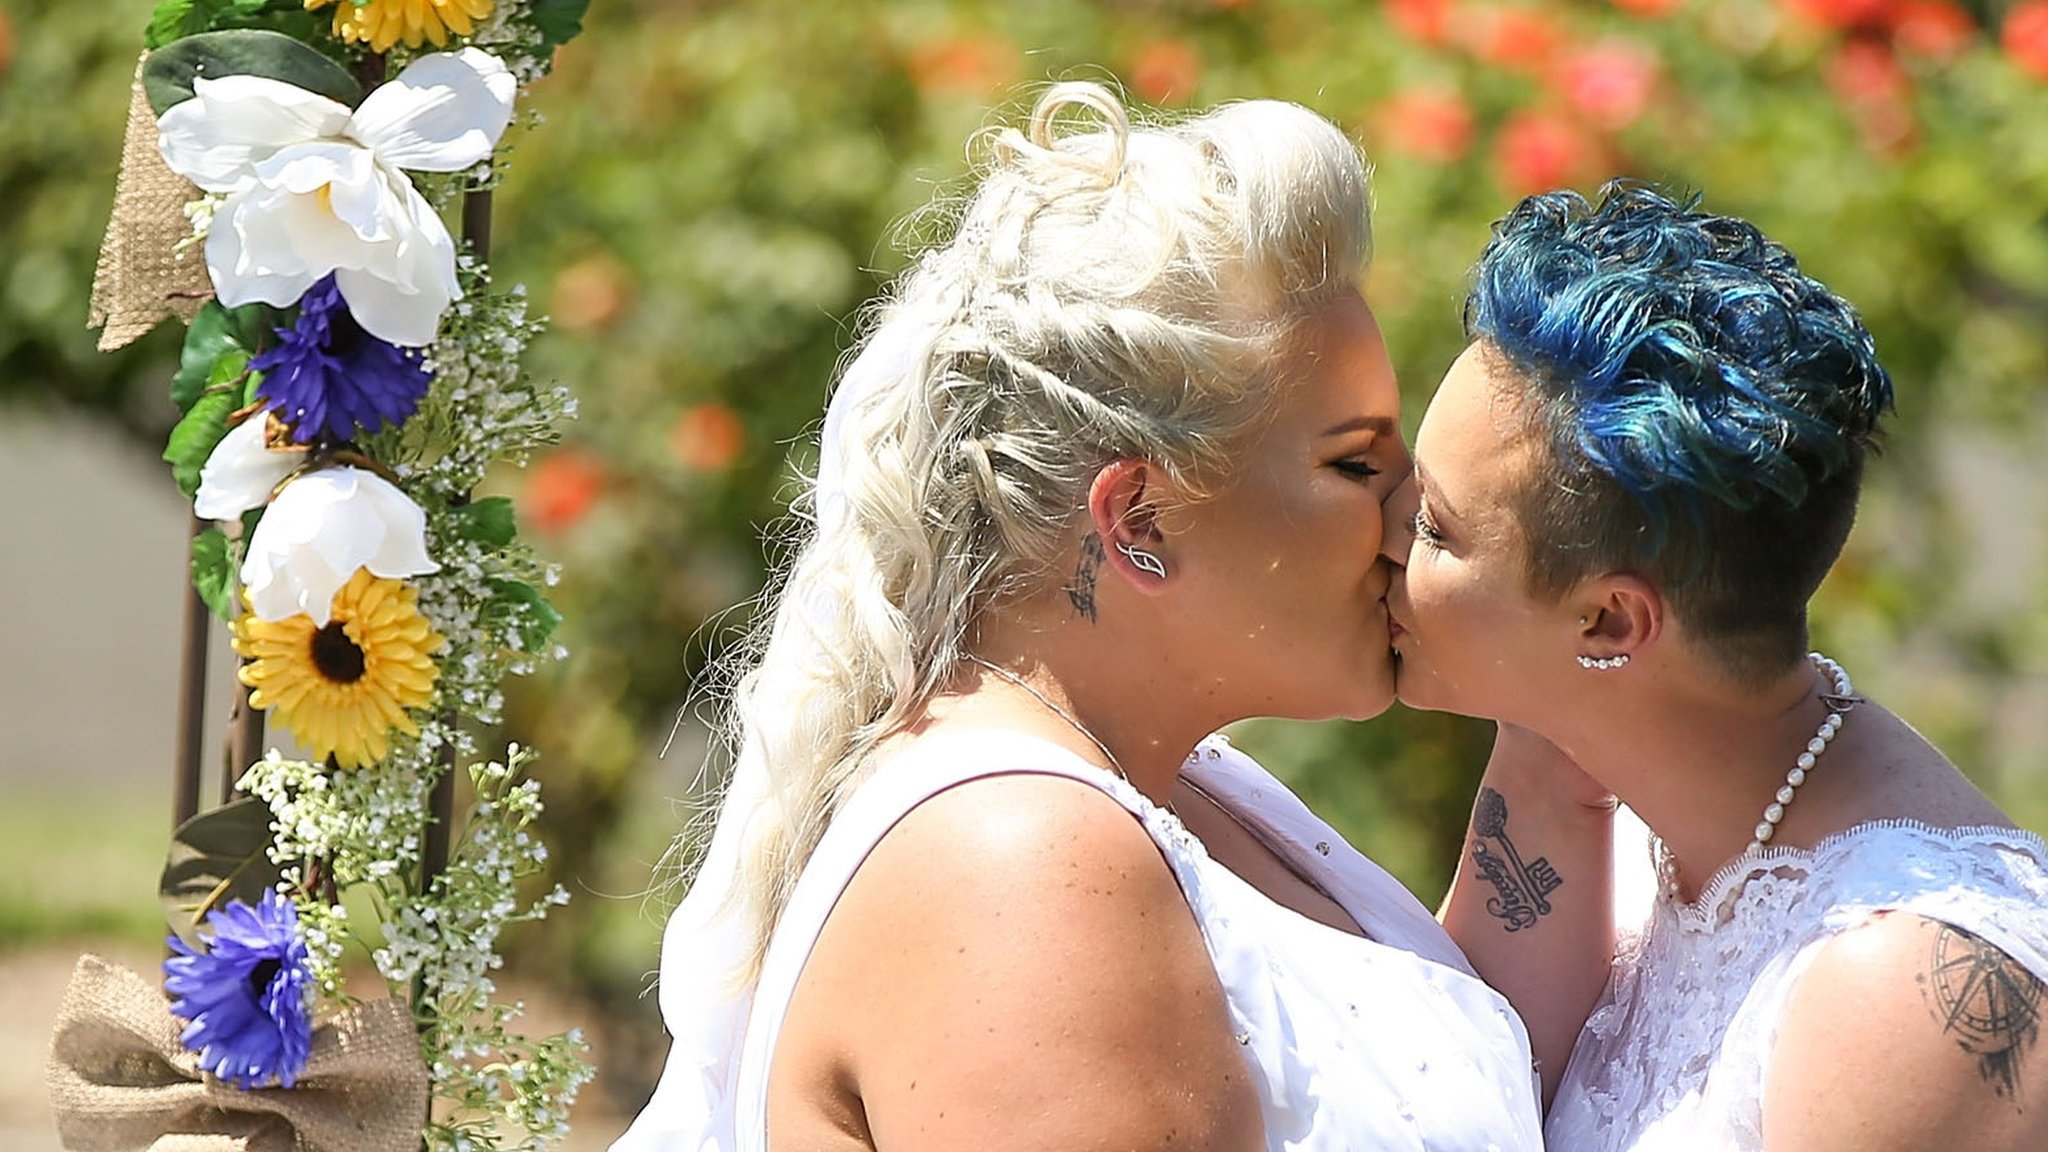 Australia's first same sex wedding takes place